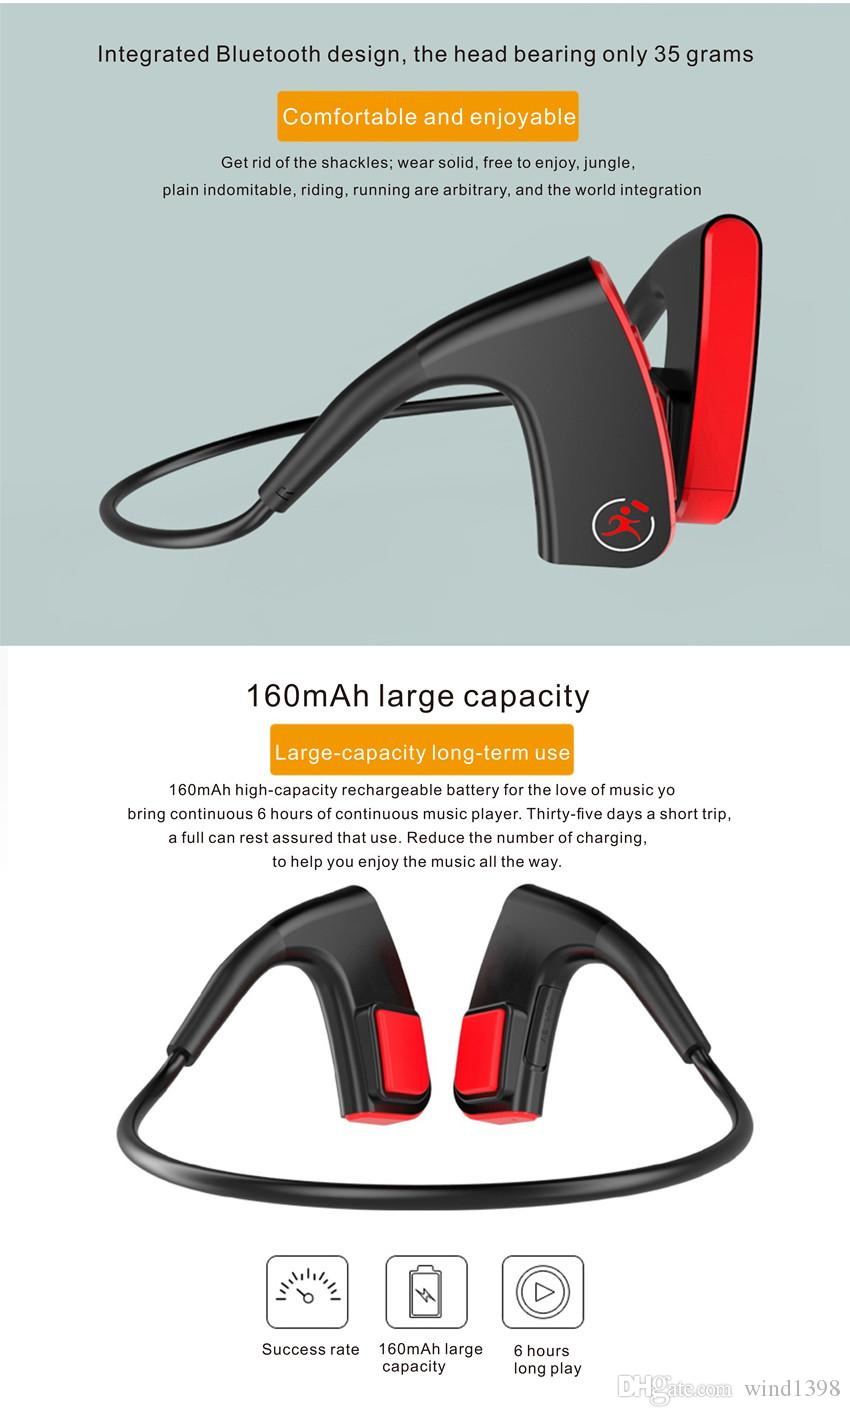 Latest E1 Bone Conduction Bluetooth Headphones Wireless Stereo Bass Hifi Headsets Noise Cancelling Outdoor sport Earphones